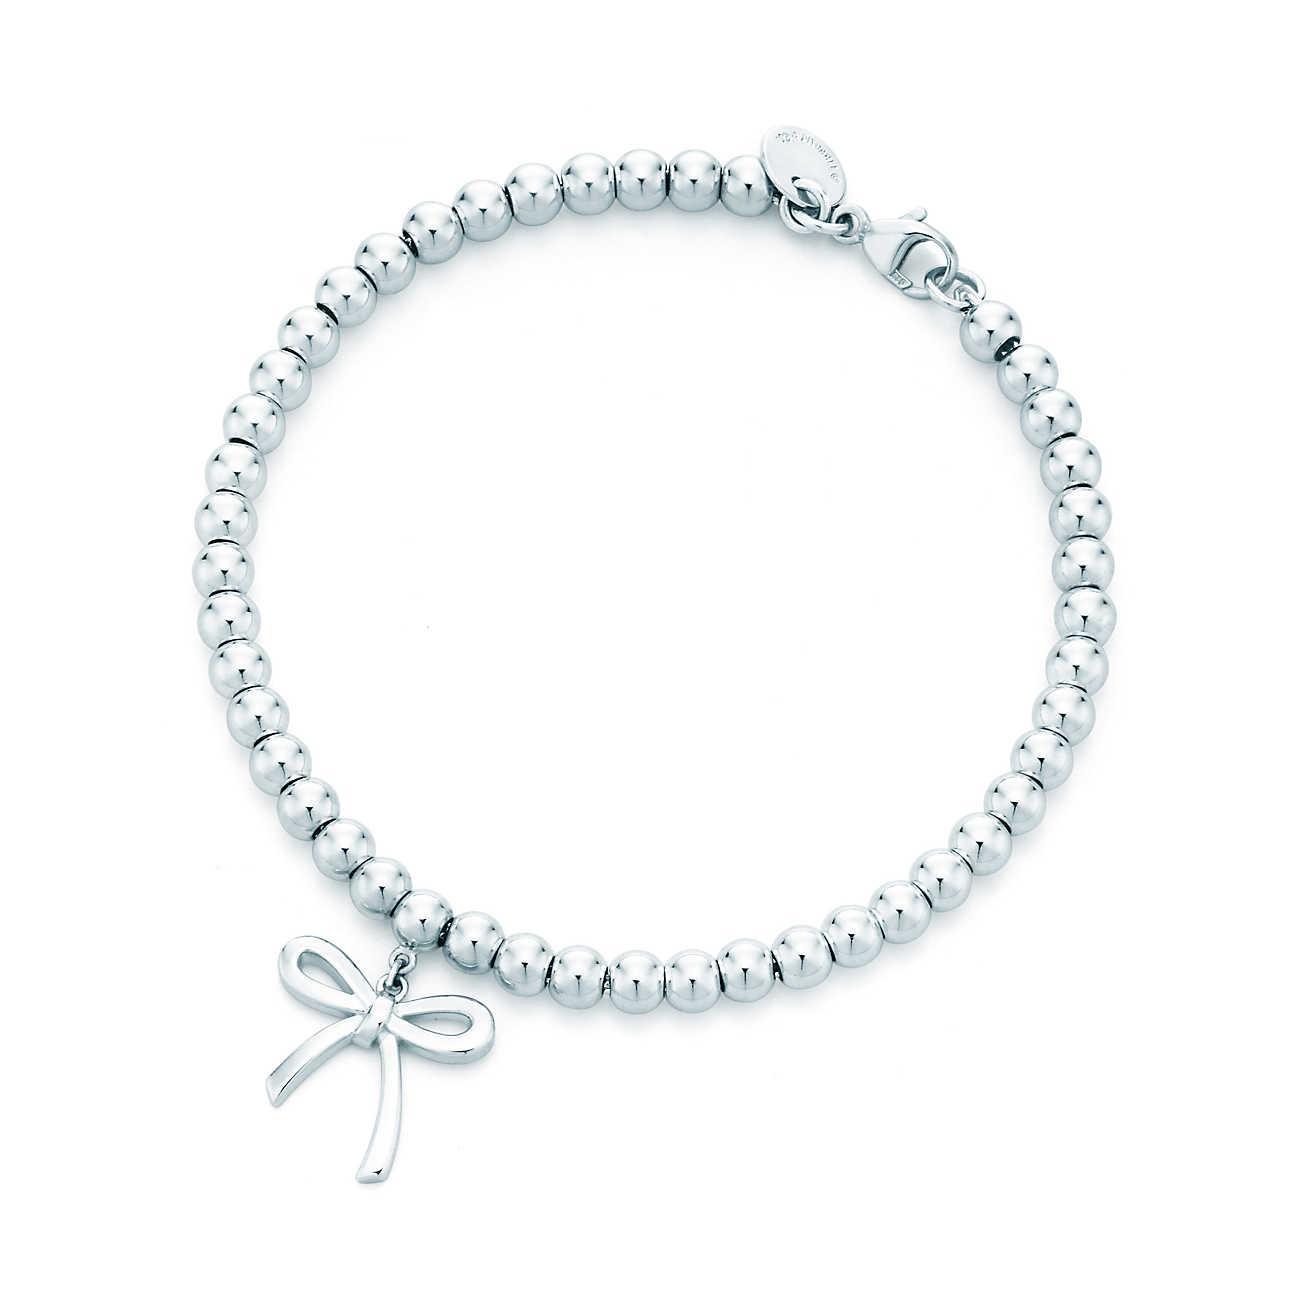 07a9b2c0c Gallery. Previously sold at: Tiffany & Co. Women's Beaded Bracelets Women's Charm  Bracelets